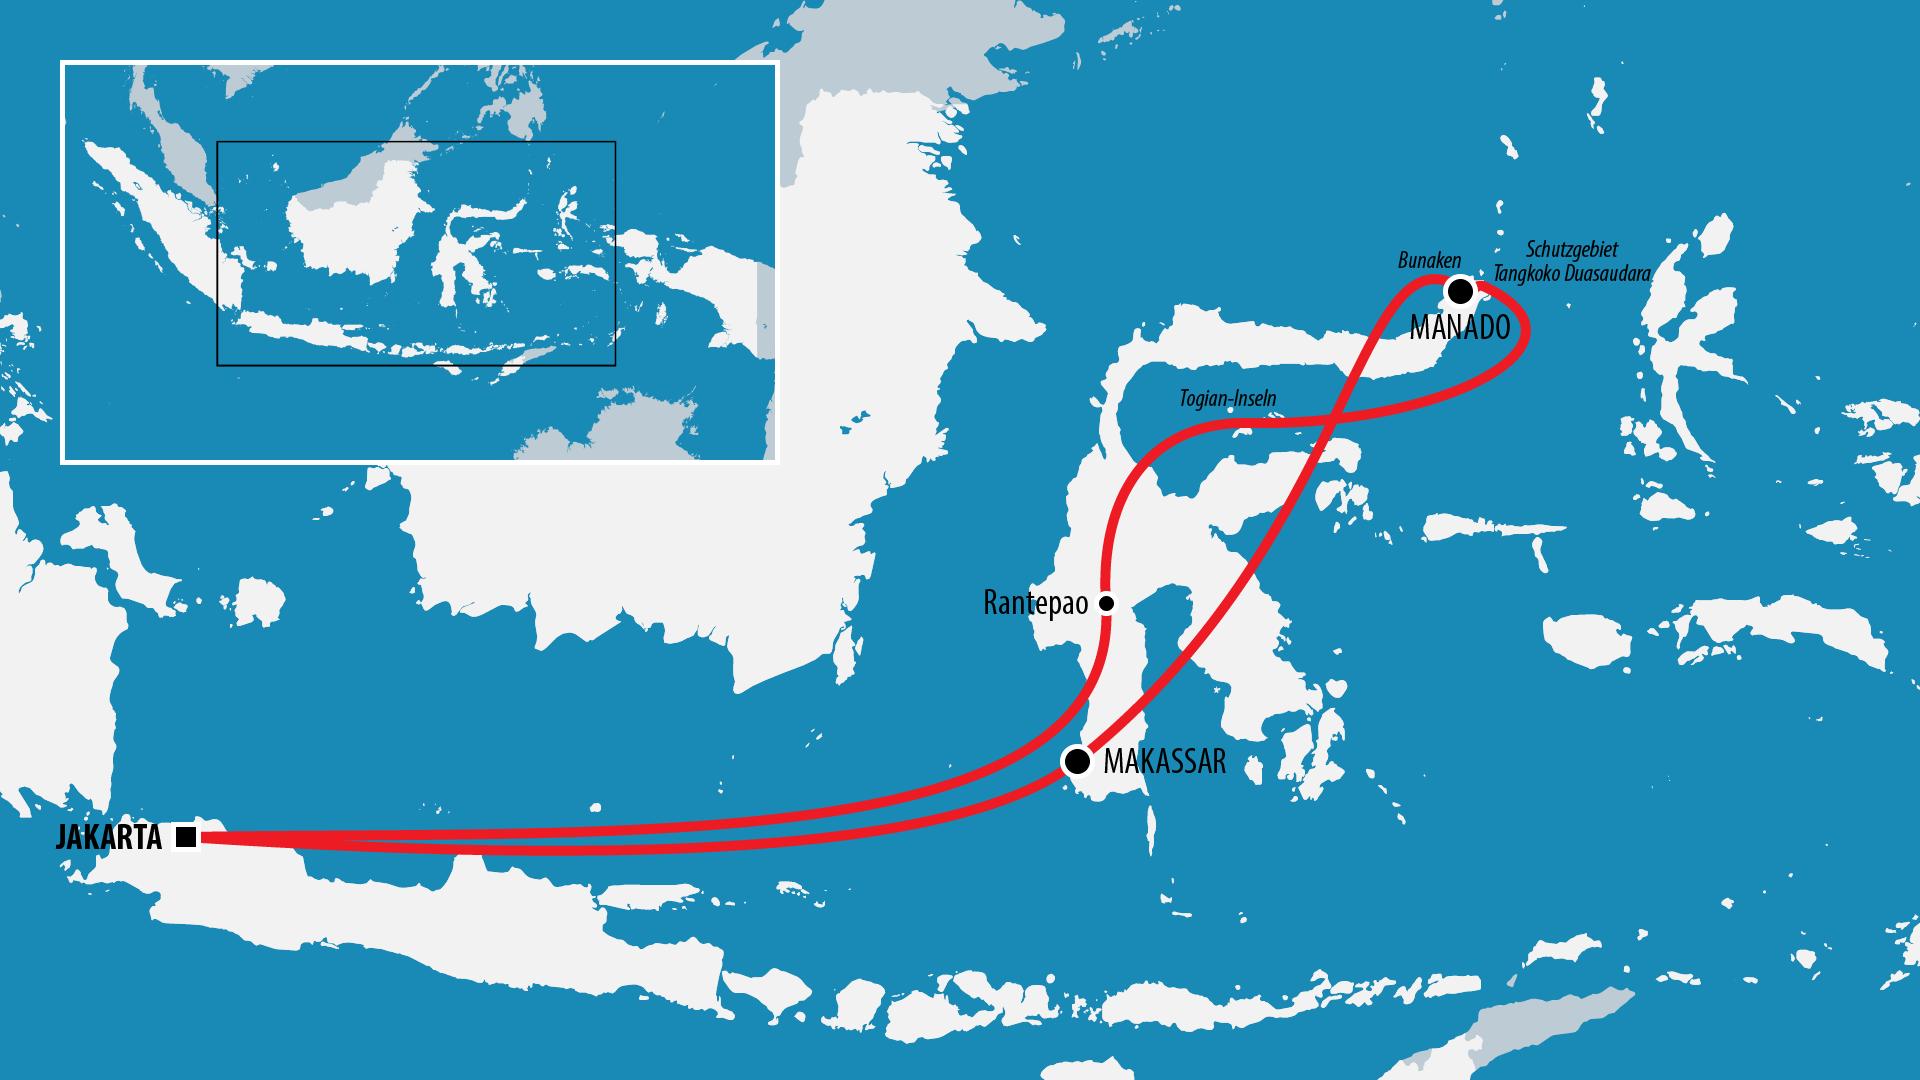 Reiseroute Indonesien 2013